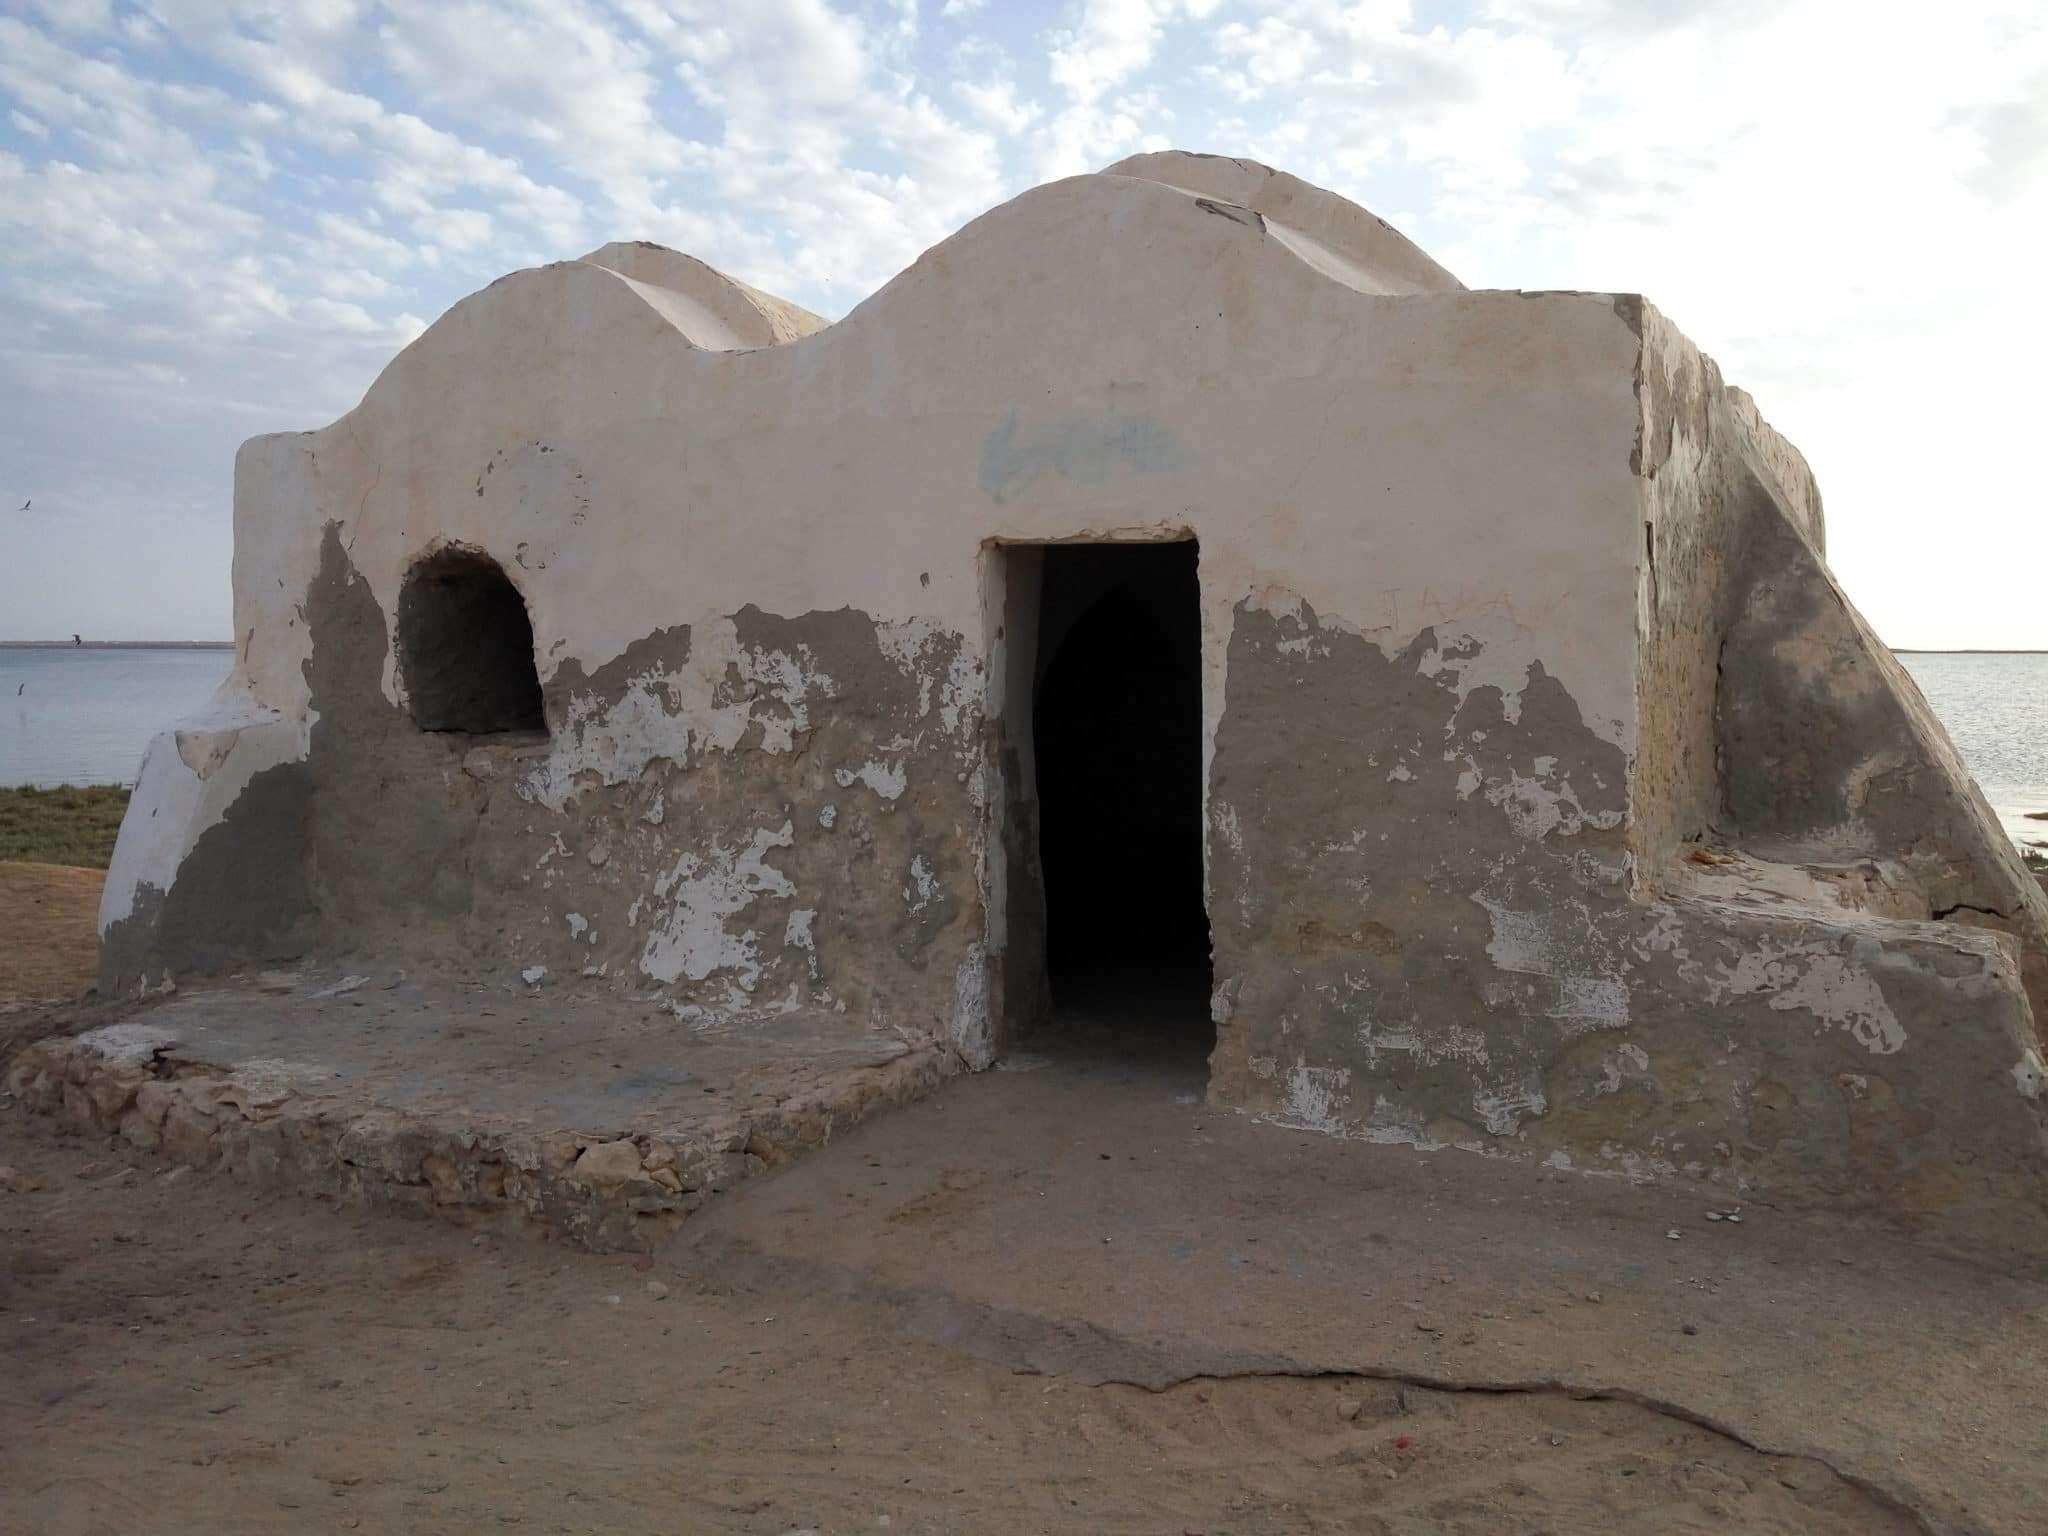 Star Wars Ben Kenobi's Home in Djerba